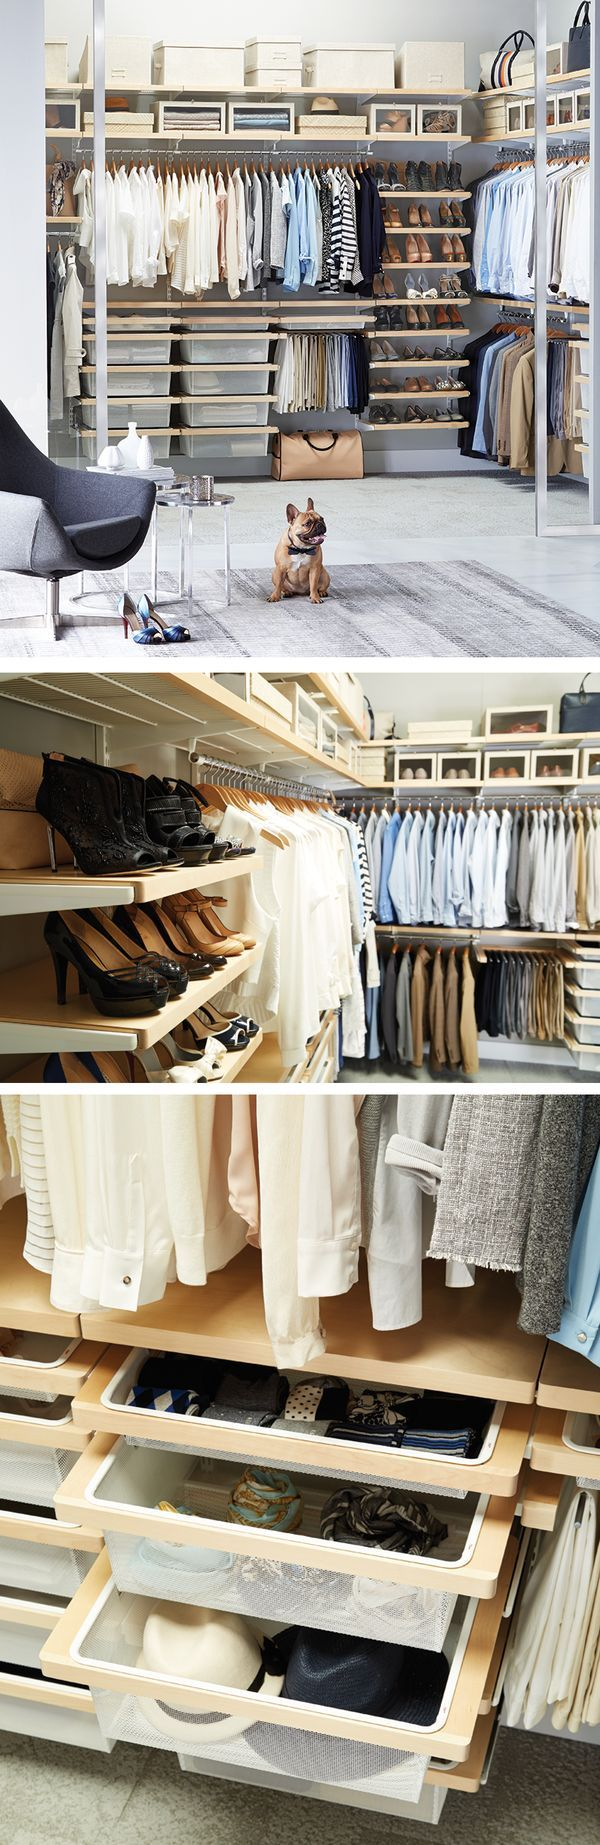 Walk In To Wonderful With Elfa Elfa Closet Pinterest Dressing